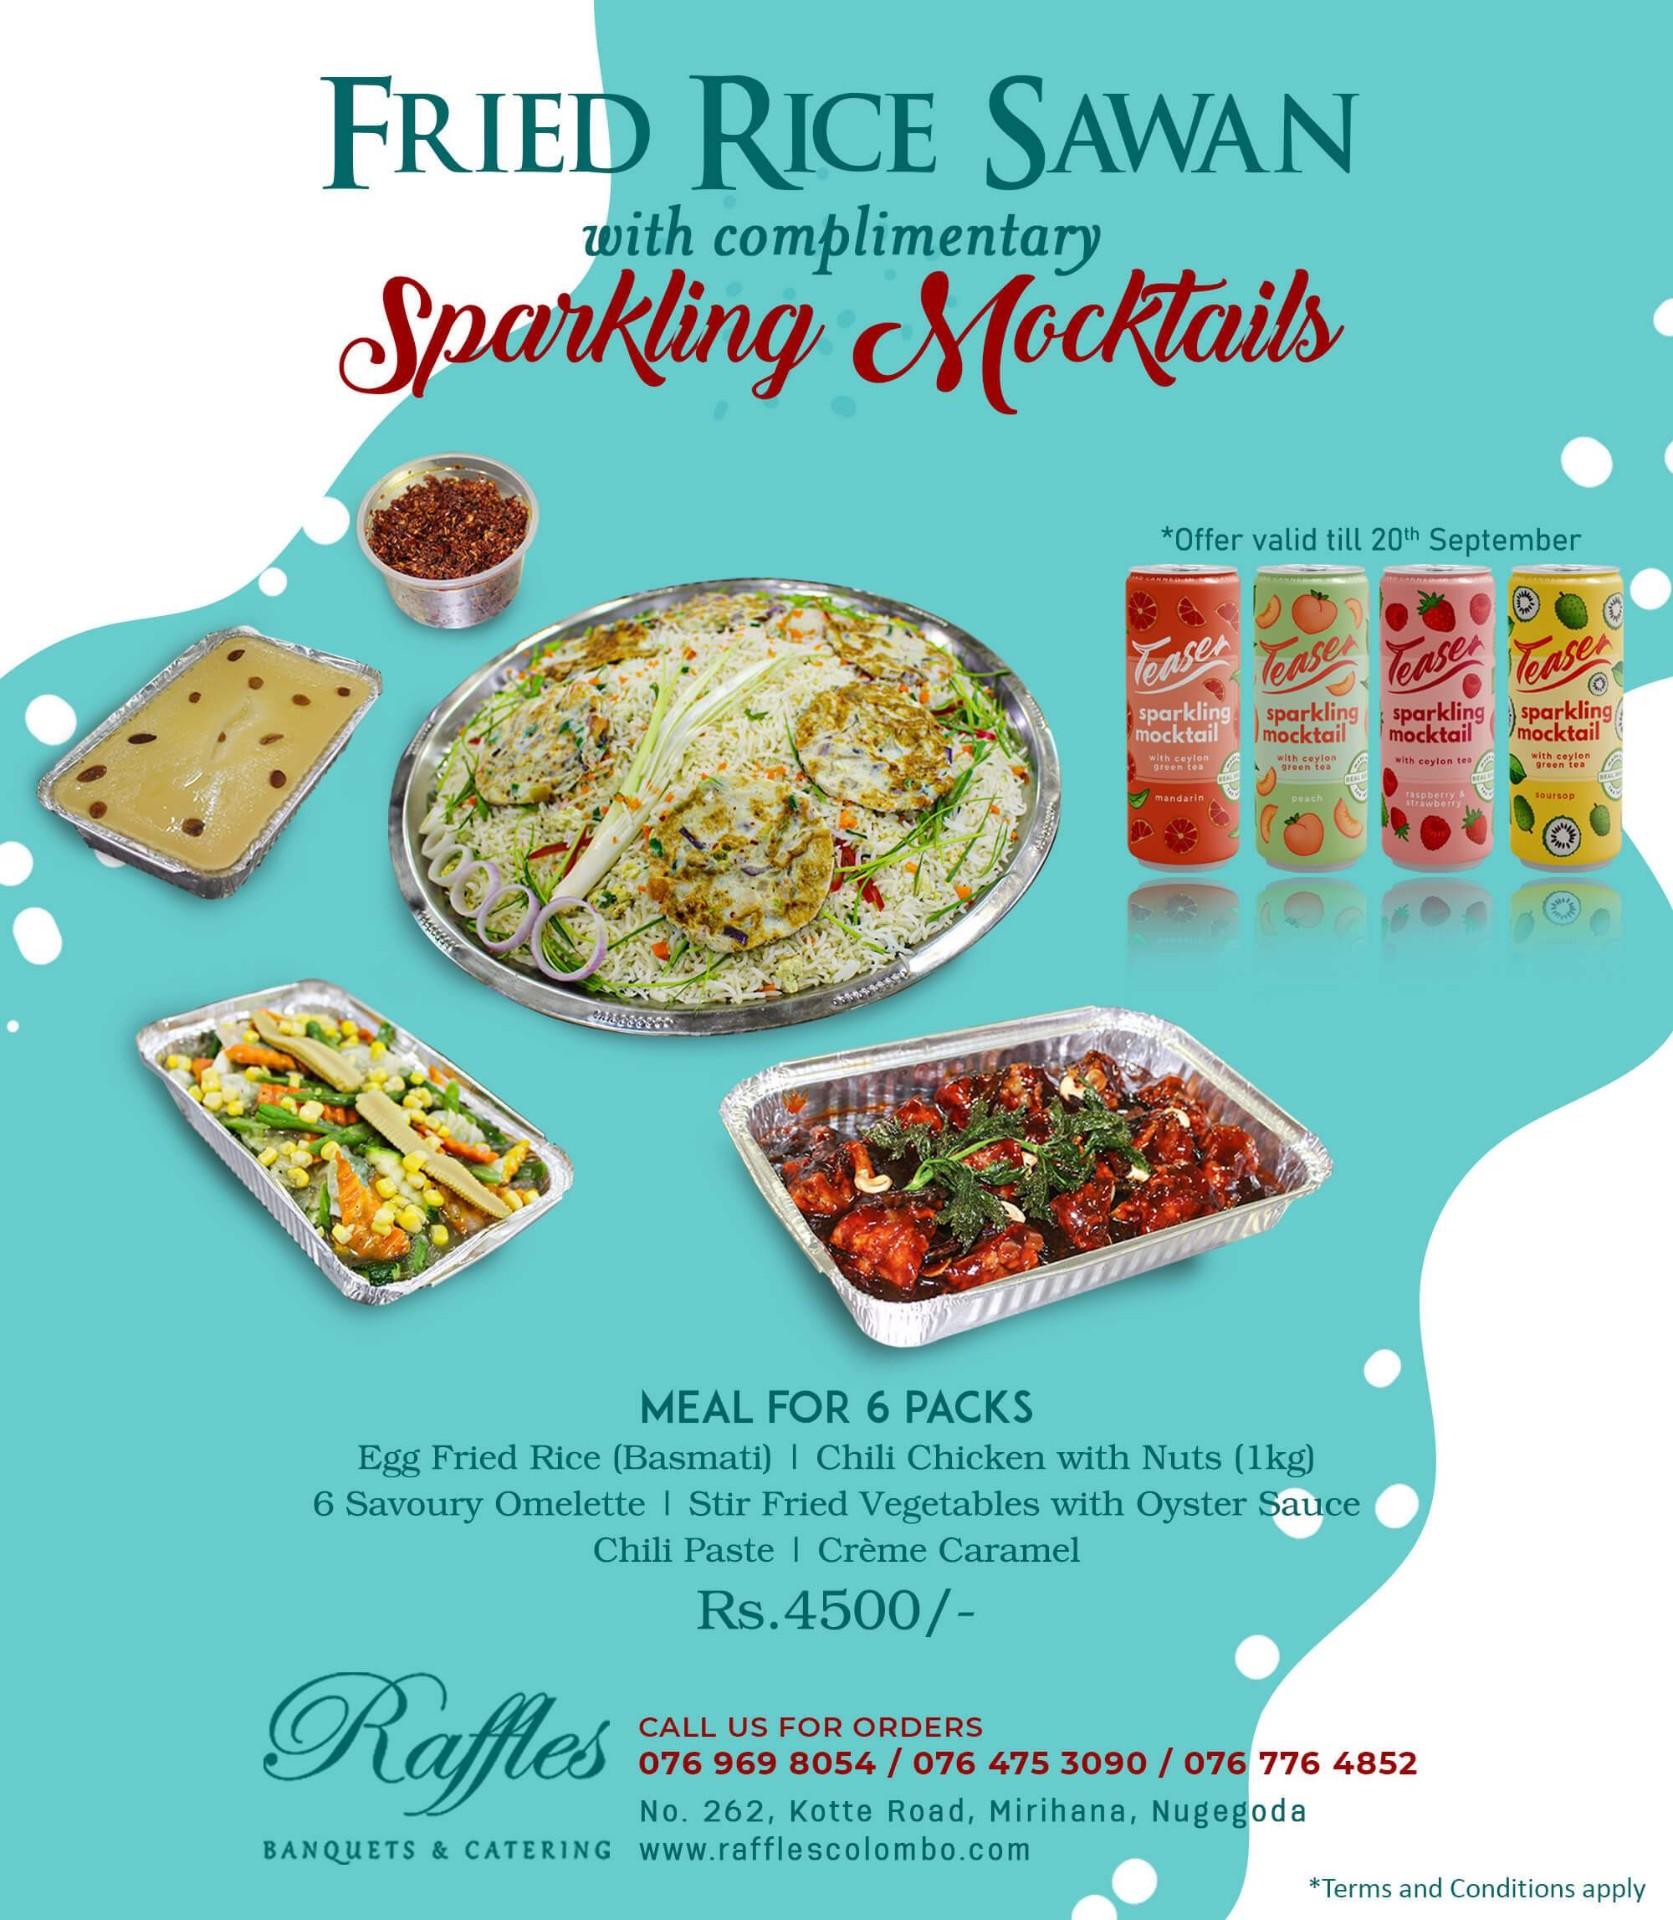 Fried Rice Sawan with Sparkling Mocktails